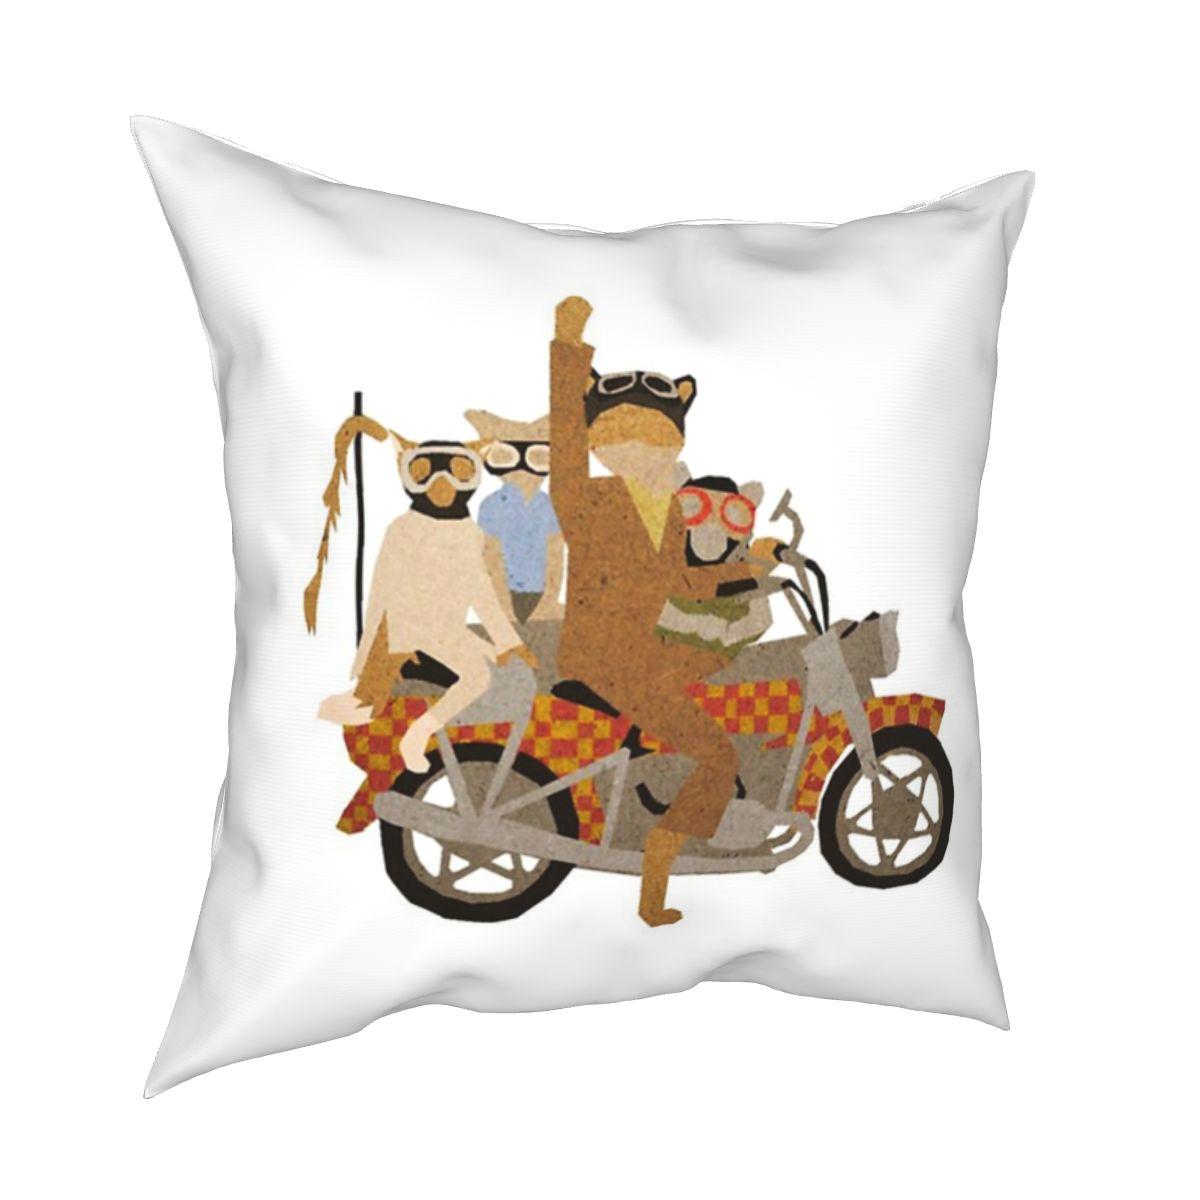 Fantastic Mr Fox Motorcycle Fox Pillowcase Printed Fabric Cushion Cover Decoration Throw Pillow Case Cover Home Zipper 40*40cm